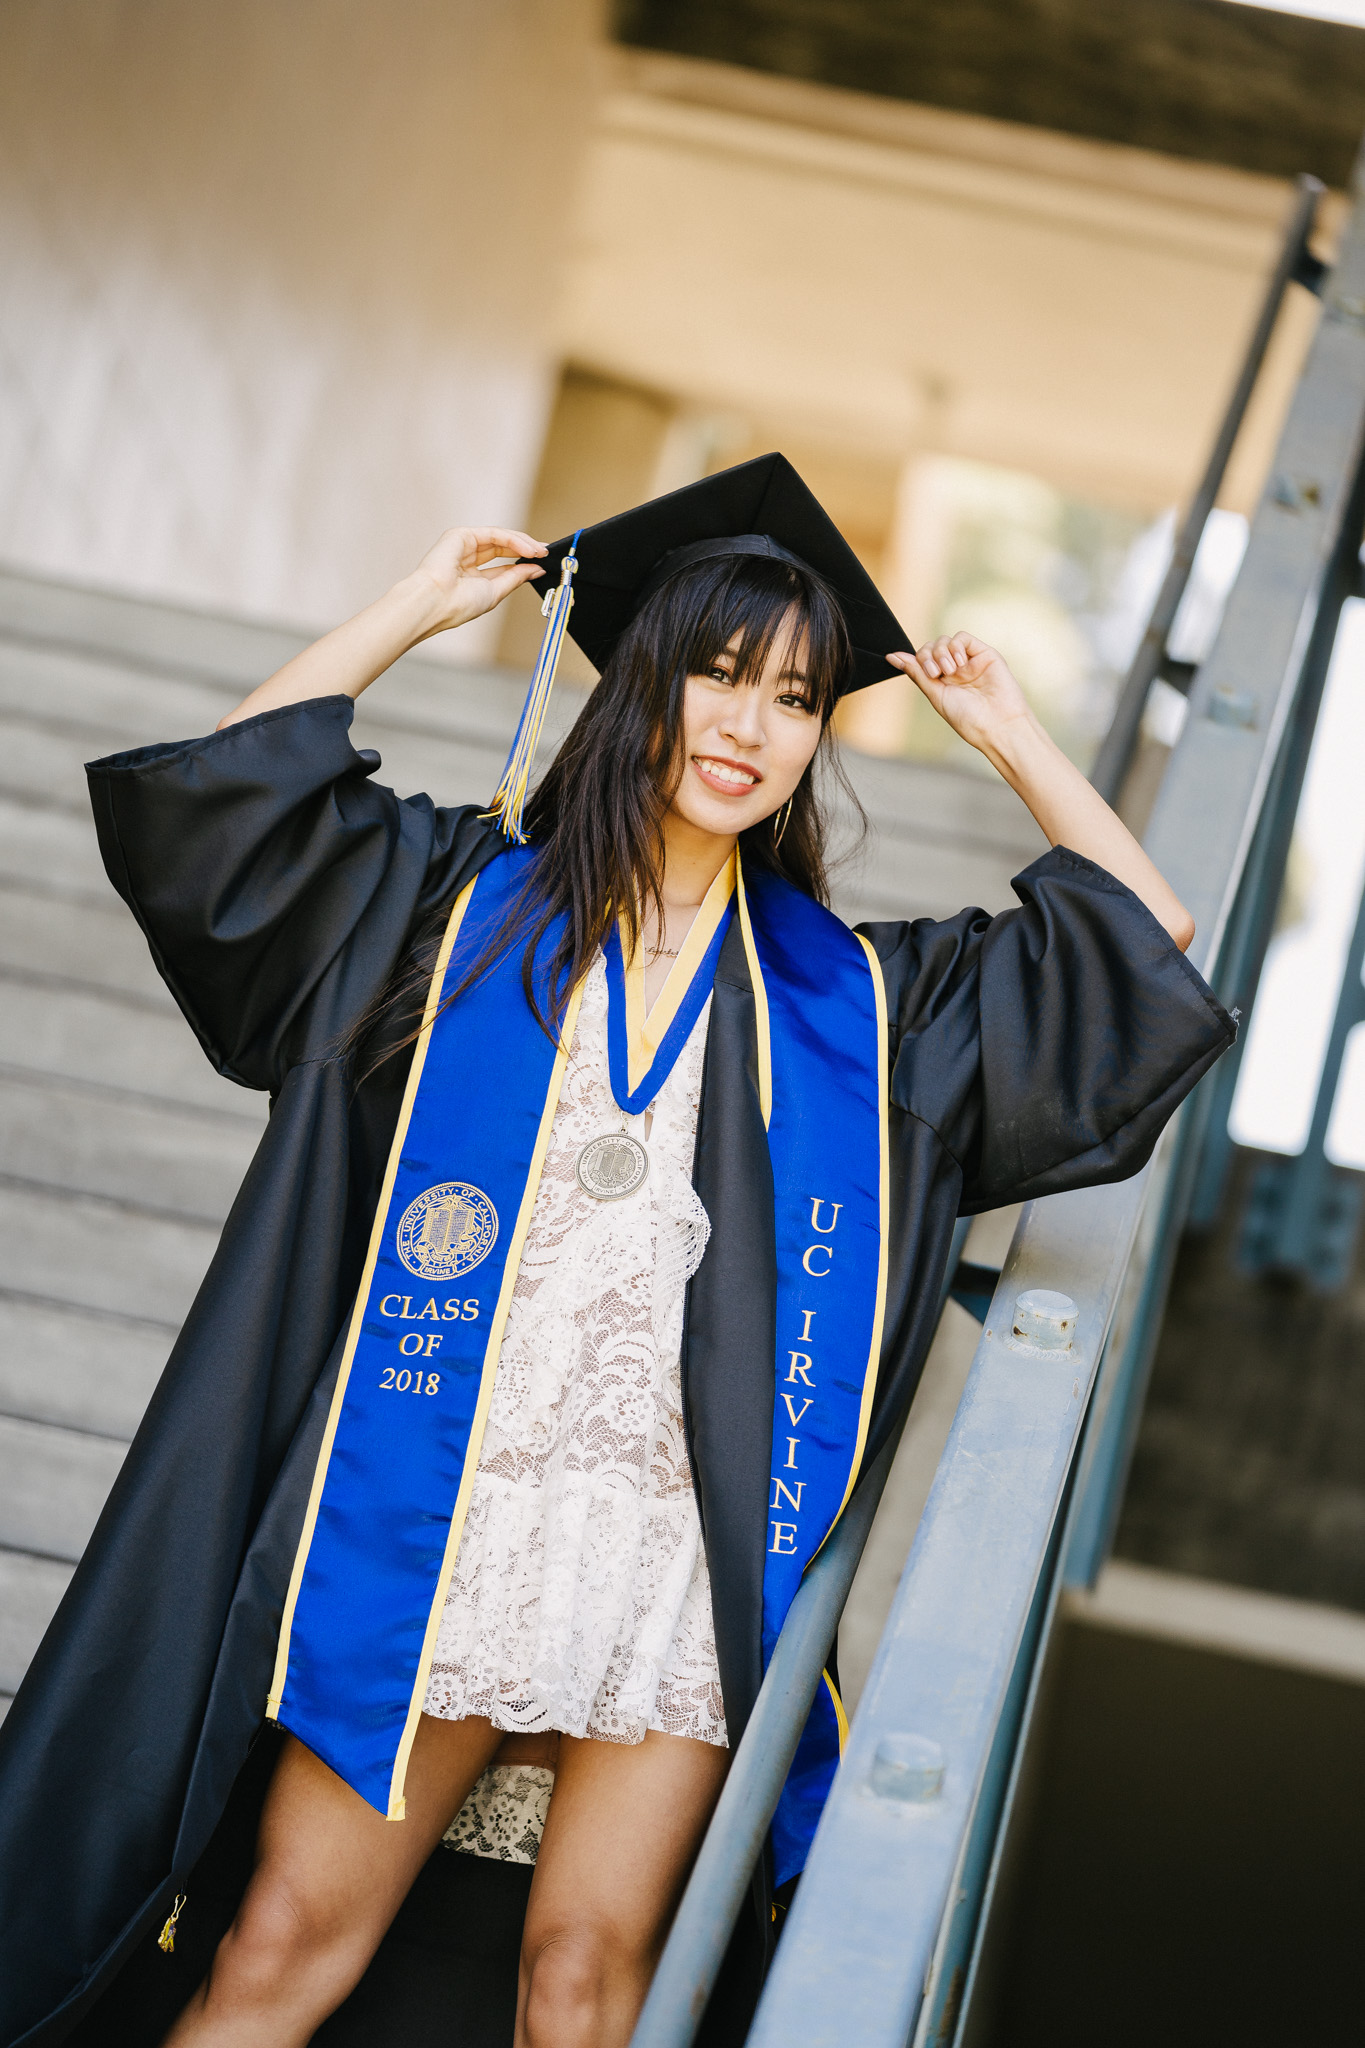 [5-16-2018] Vi's Graduation Photoshoot127.jpg